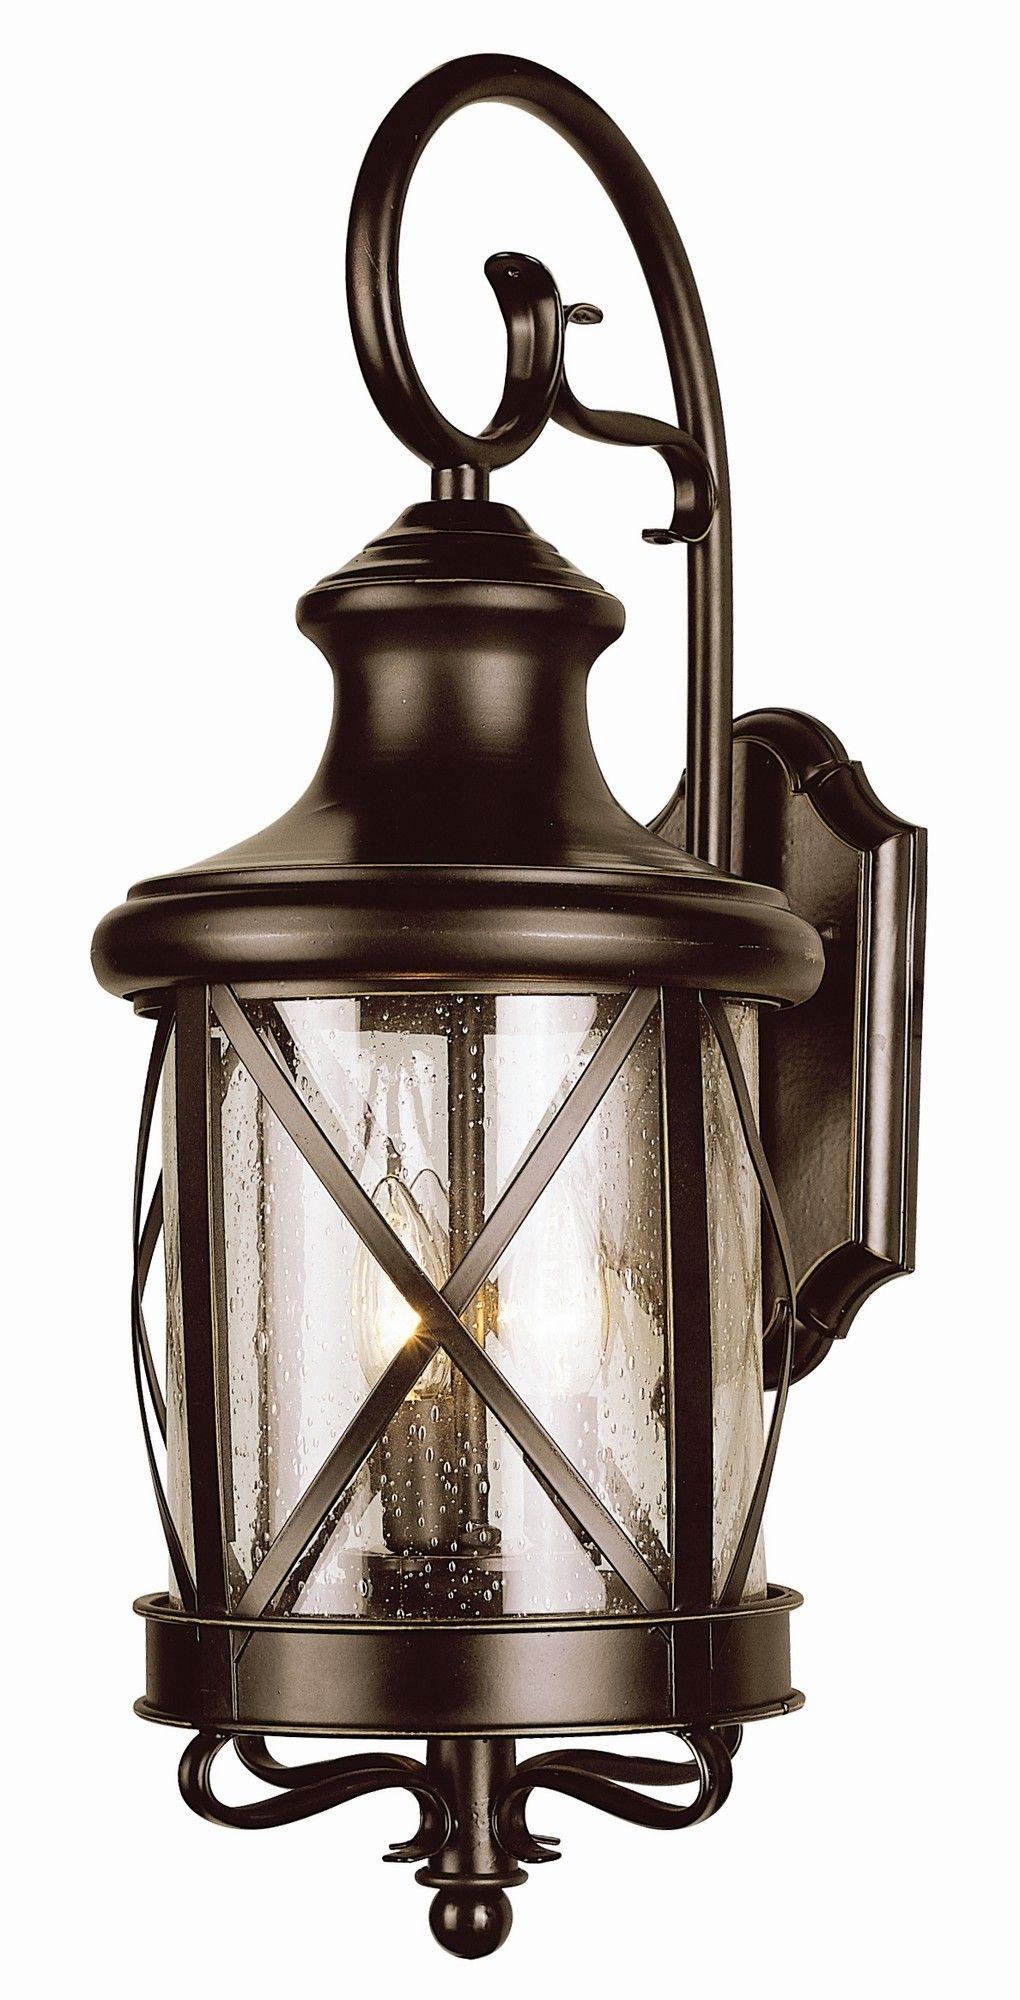 Inspiration about Transglobe Lighting Outdoor Wall Lantern | Wayfair | Lighting Within Outdoor Wall Lighting At Wayfair (#7 of 15)